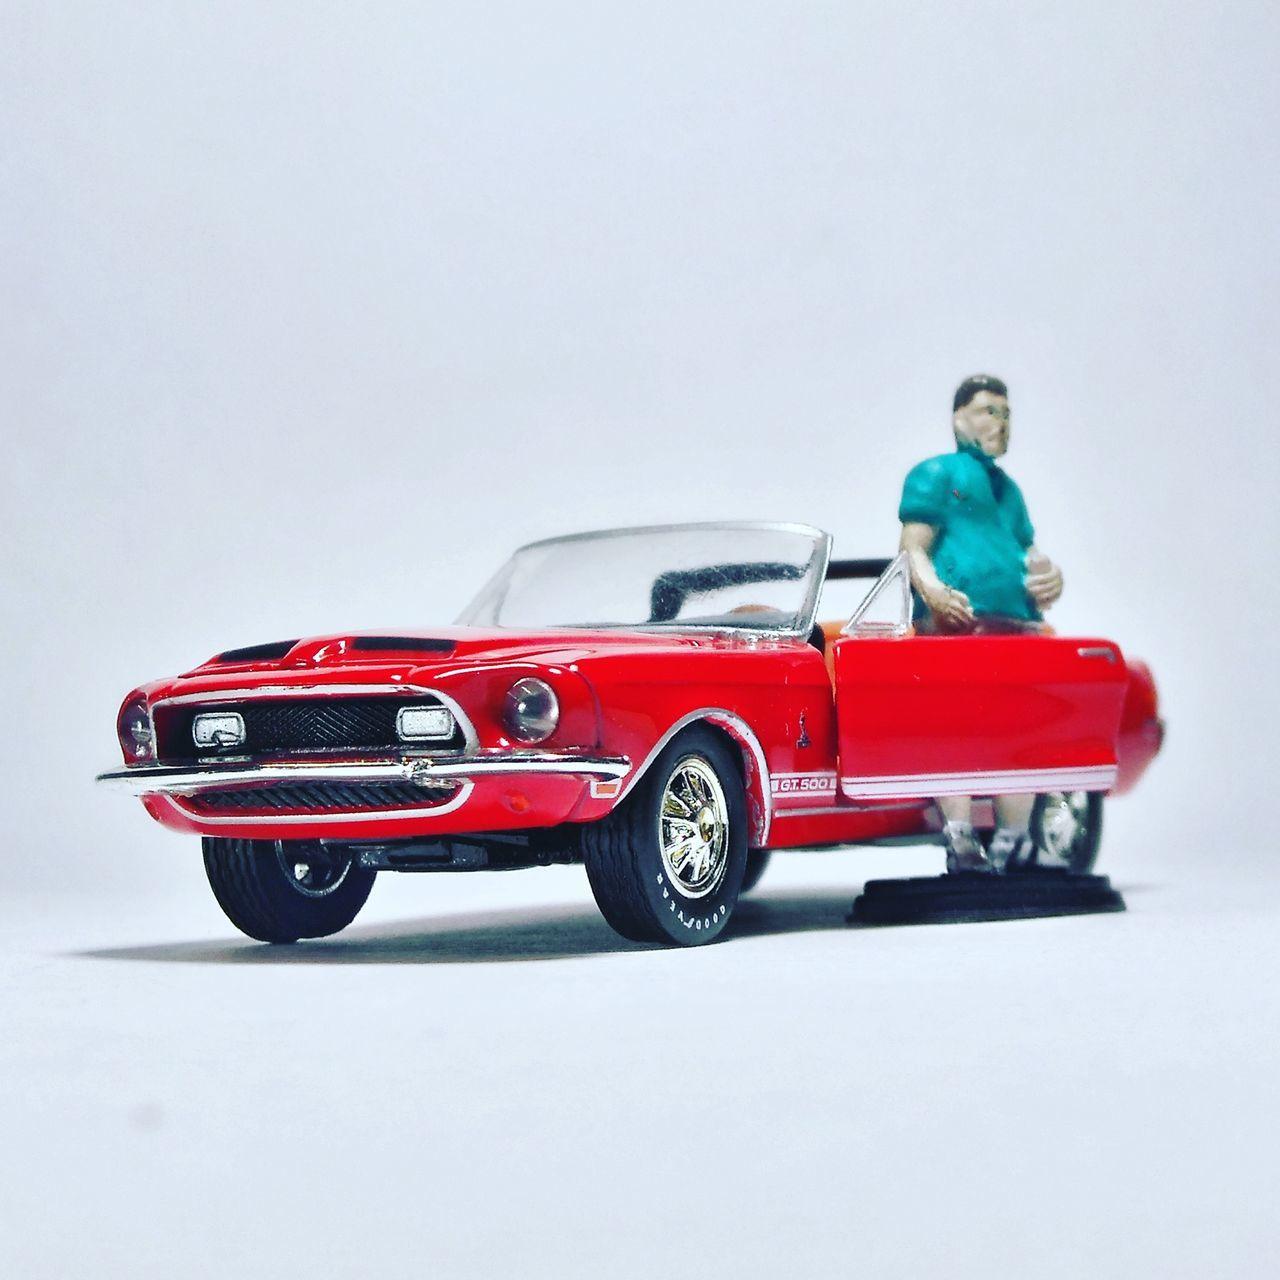 Mustang Love Diecastphotography Diecastphotographyindonesia HotWheels Collector Diorama Like Photos Dioramas Diecastcar